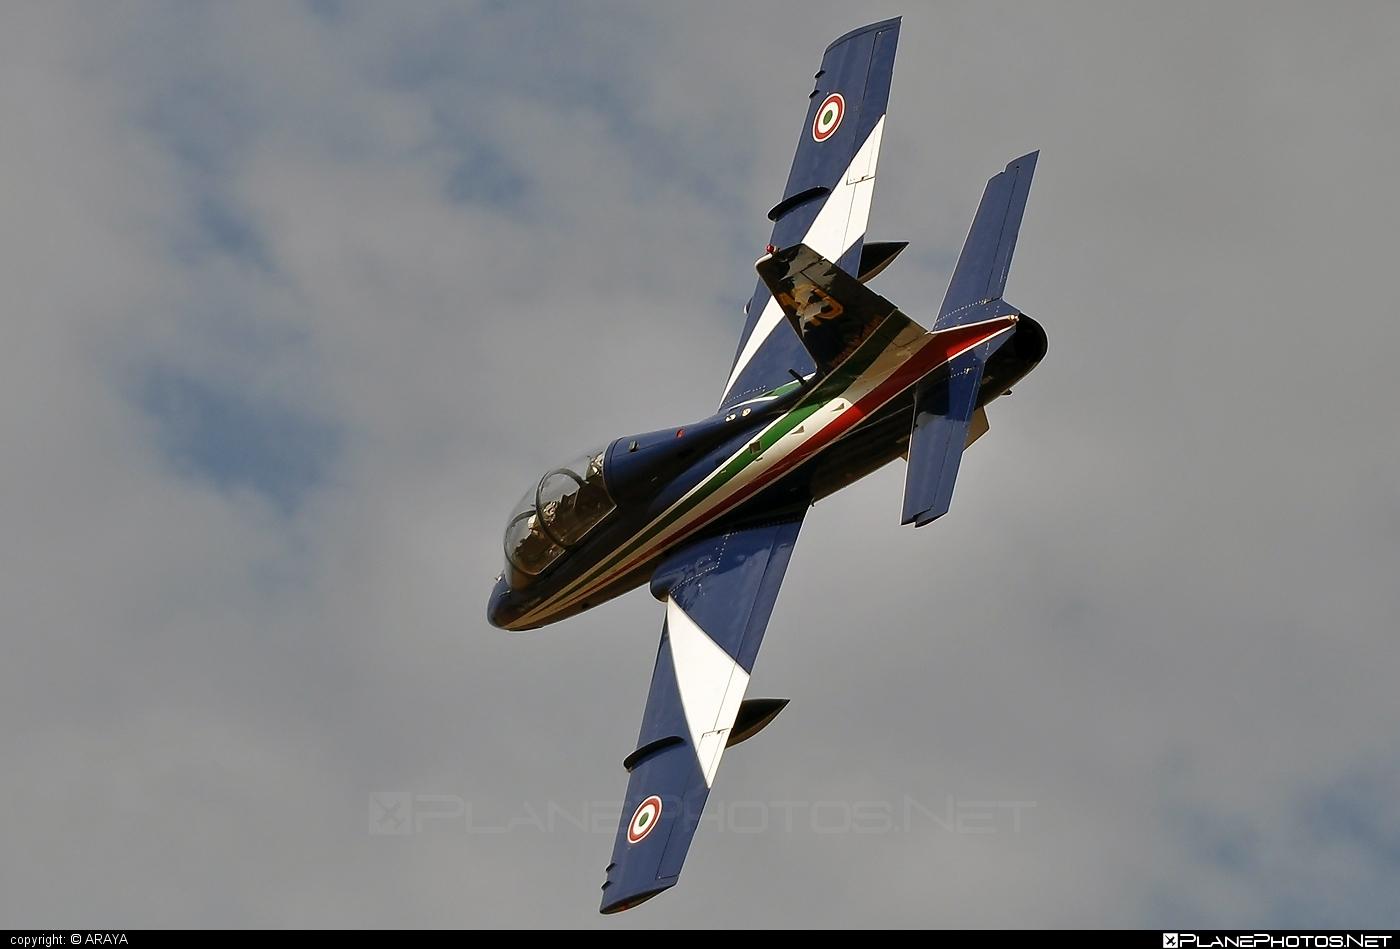 Aermacchi MB-339-A/PAN - MM54514 operated by Aeronautica Militare (Italian Air Force) #aermacchi #aermacchi339 #aermacchimb339 #aermacchimb339apan #mb339 #mb339apan